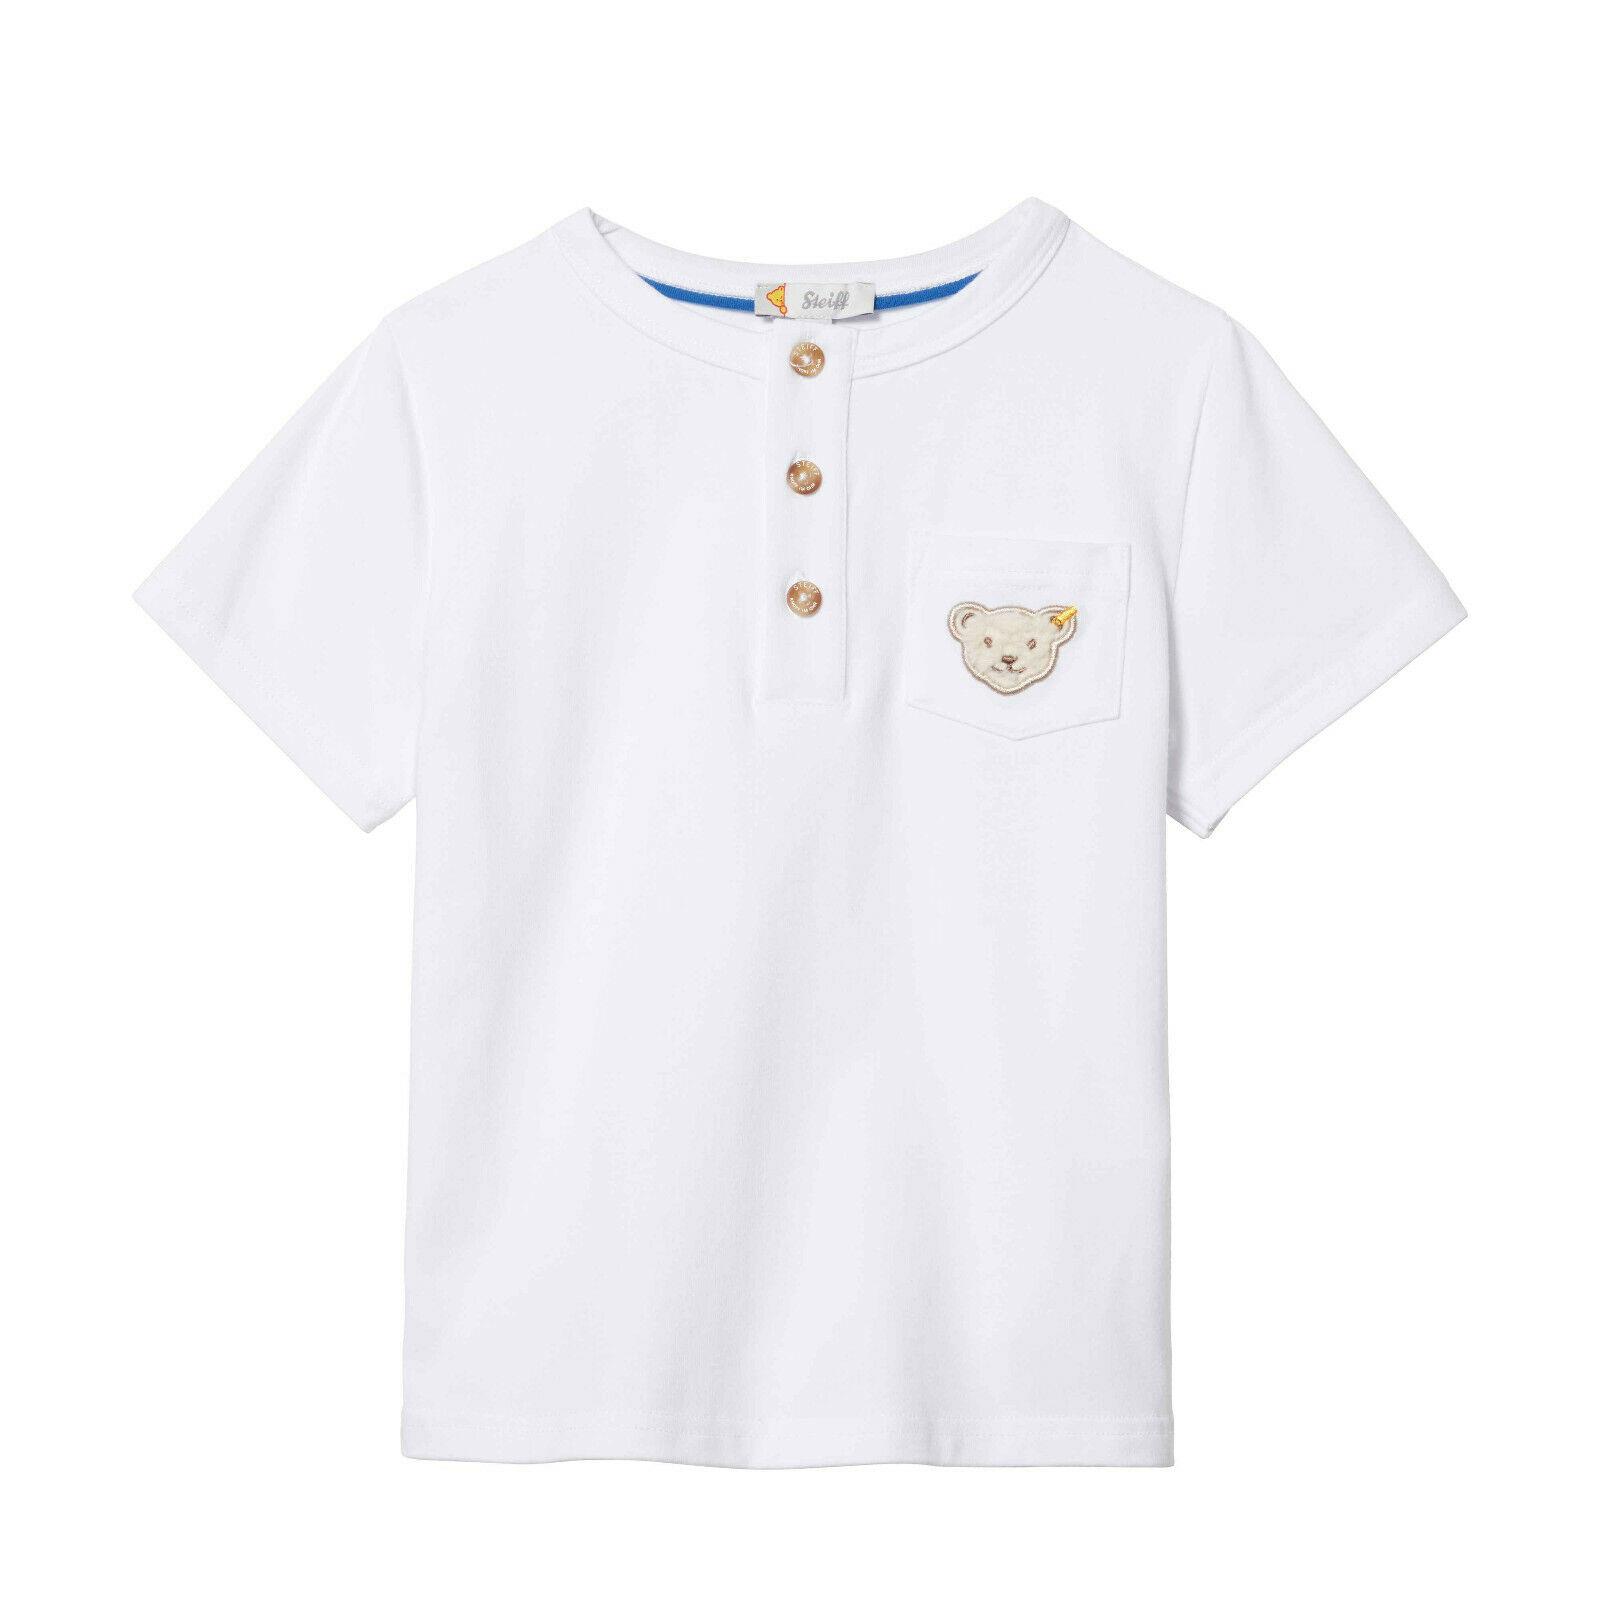 wei/ß Trikot Look 56-86 Kroatien Baby EM T-Shirt Gr